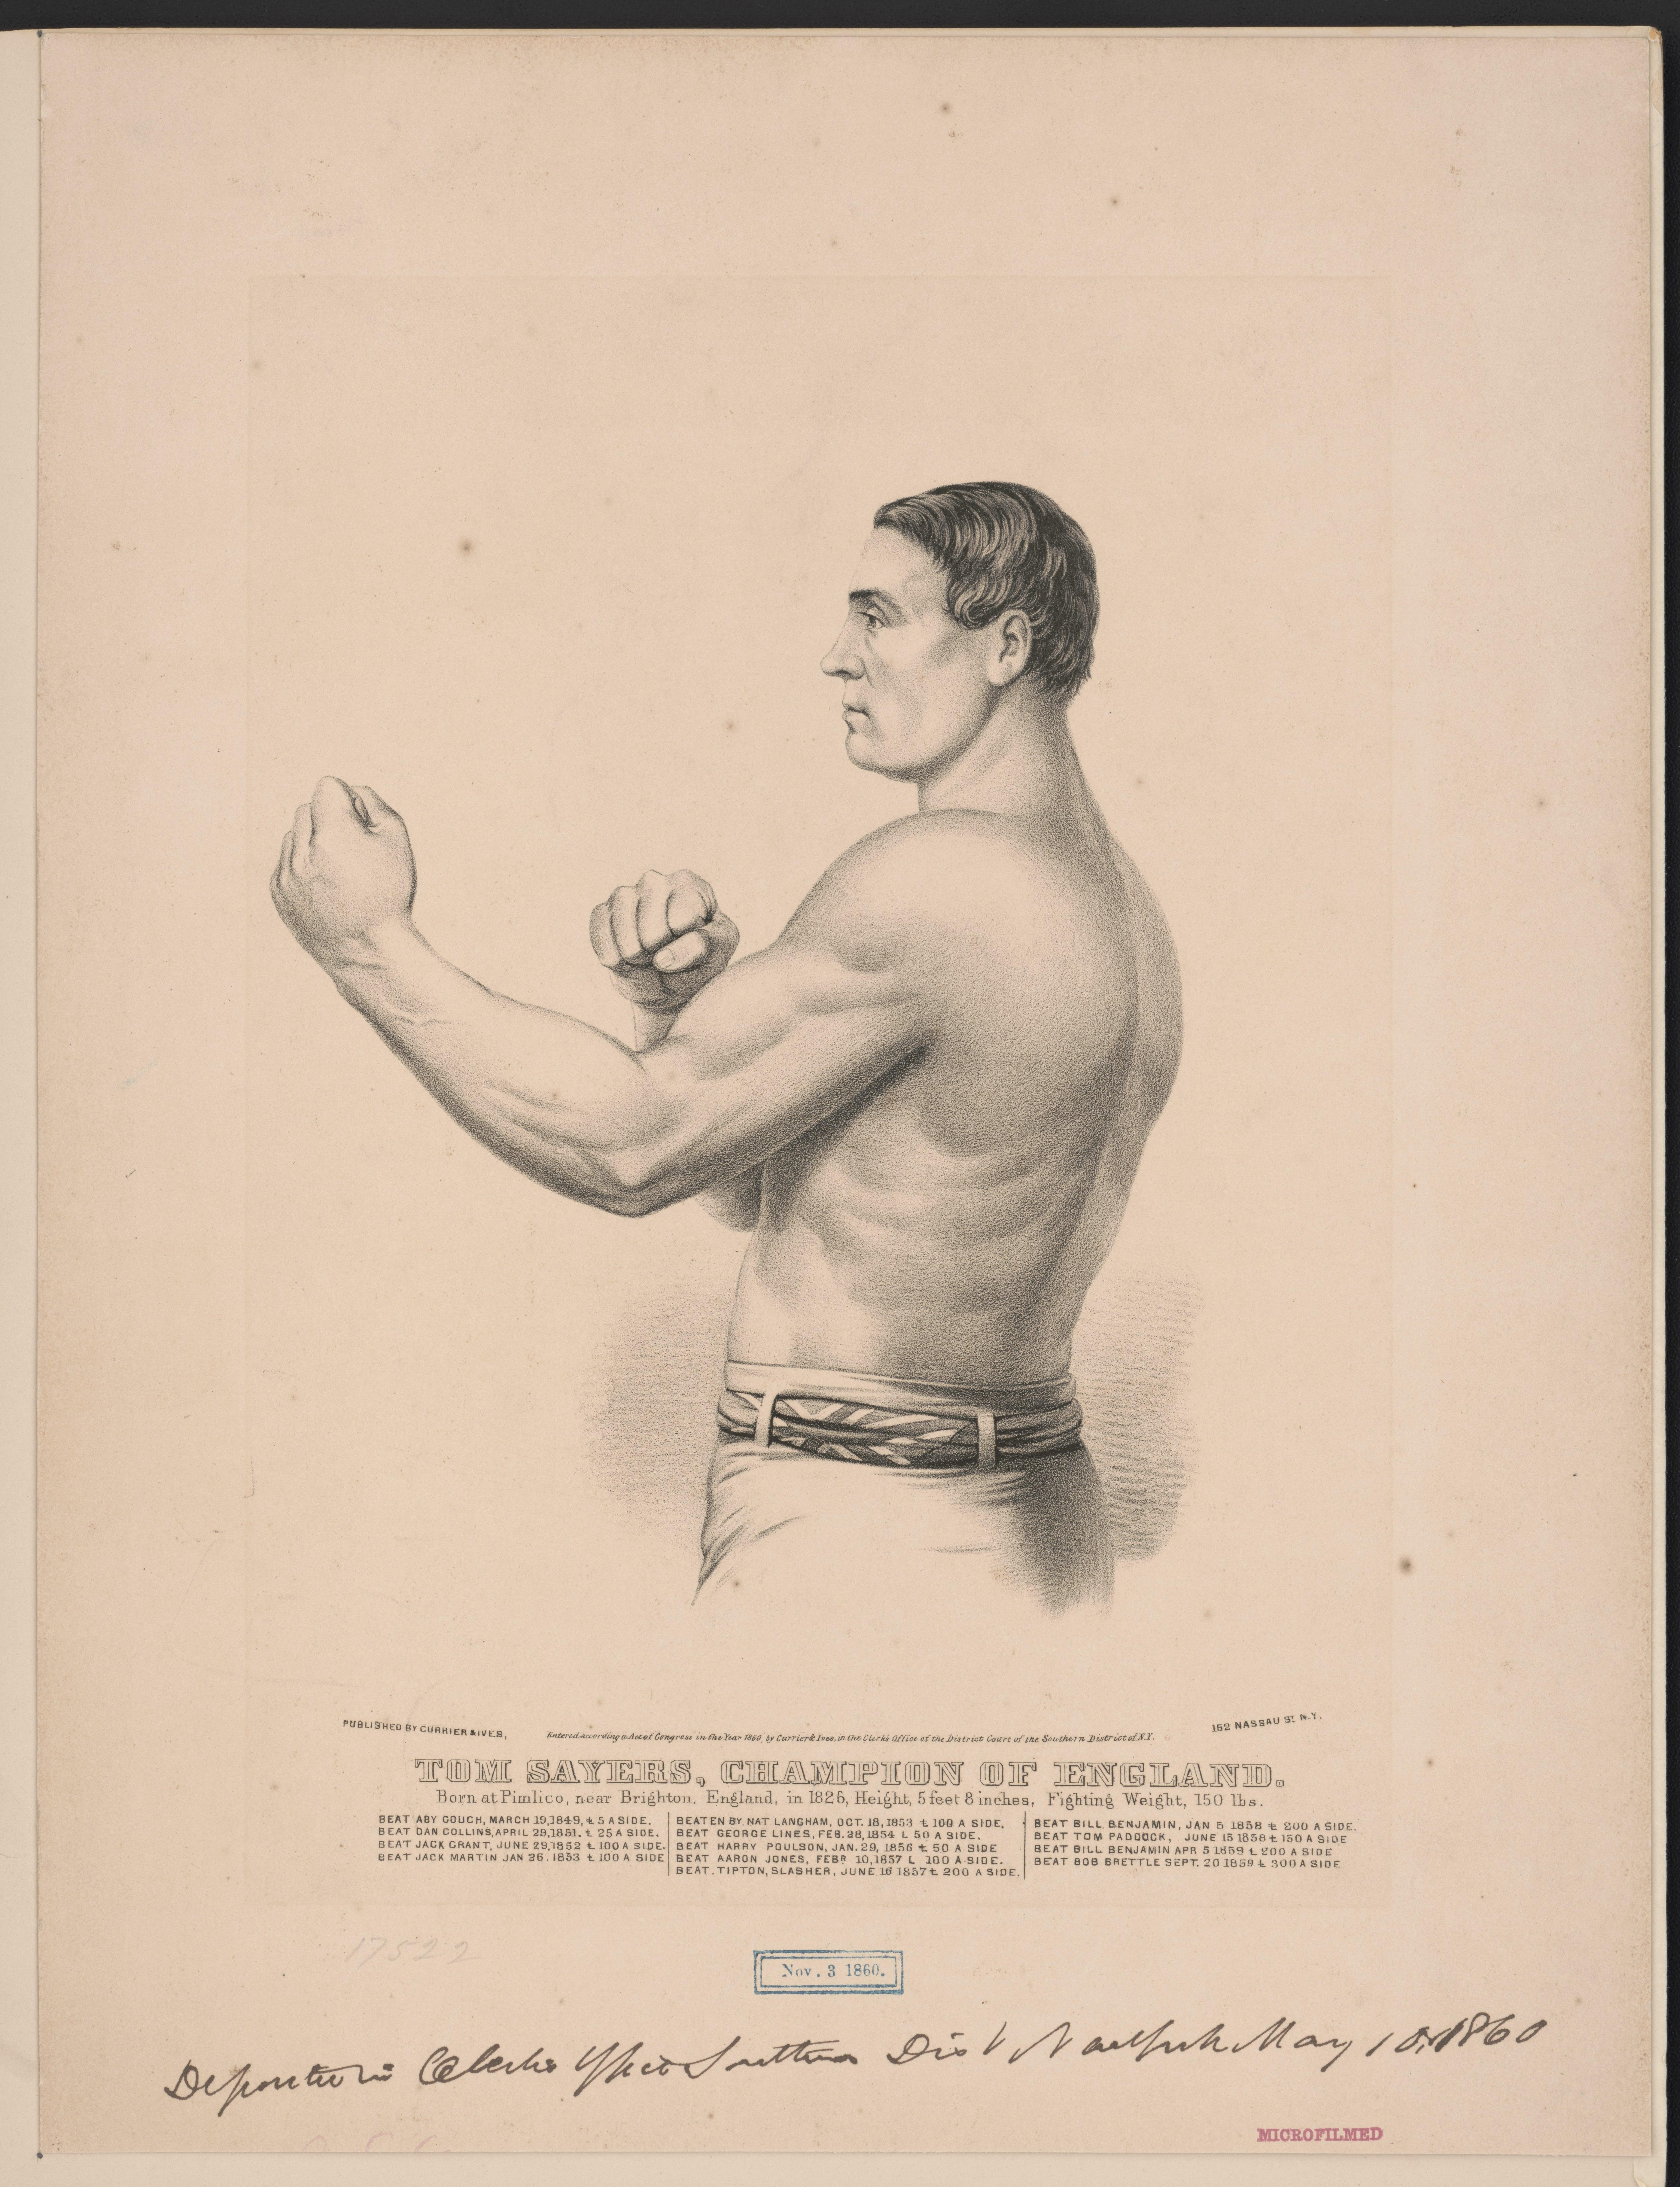 File:Tom Sayers, champion of England- born at Pimlico, near